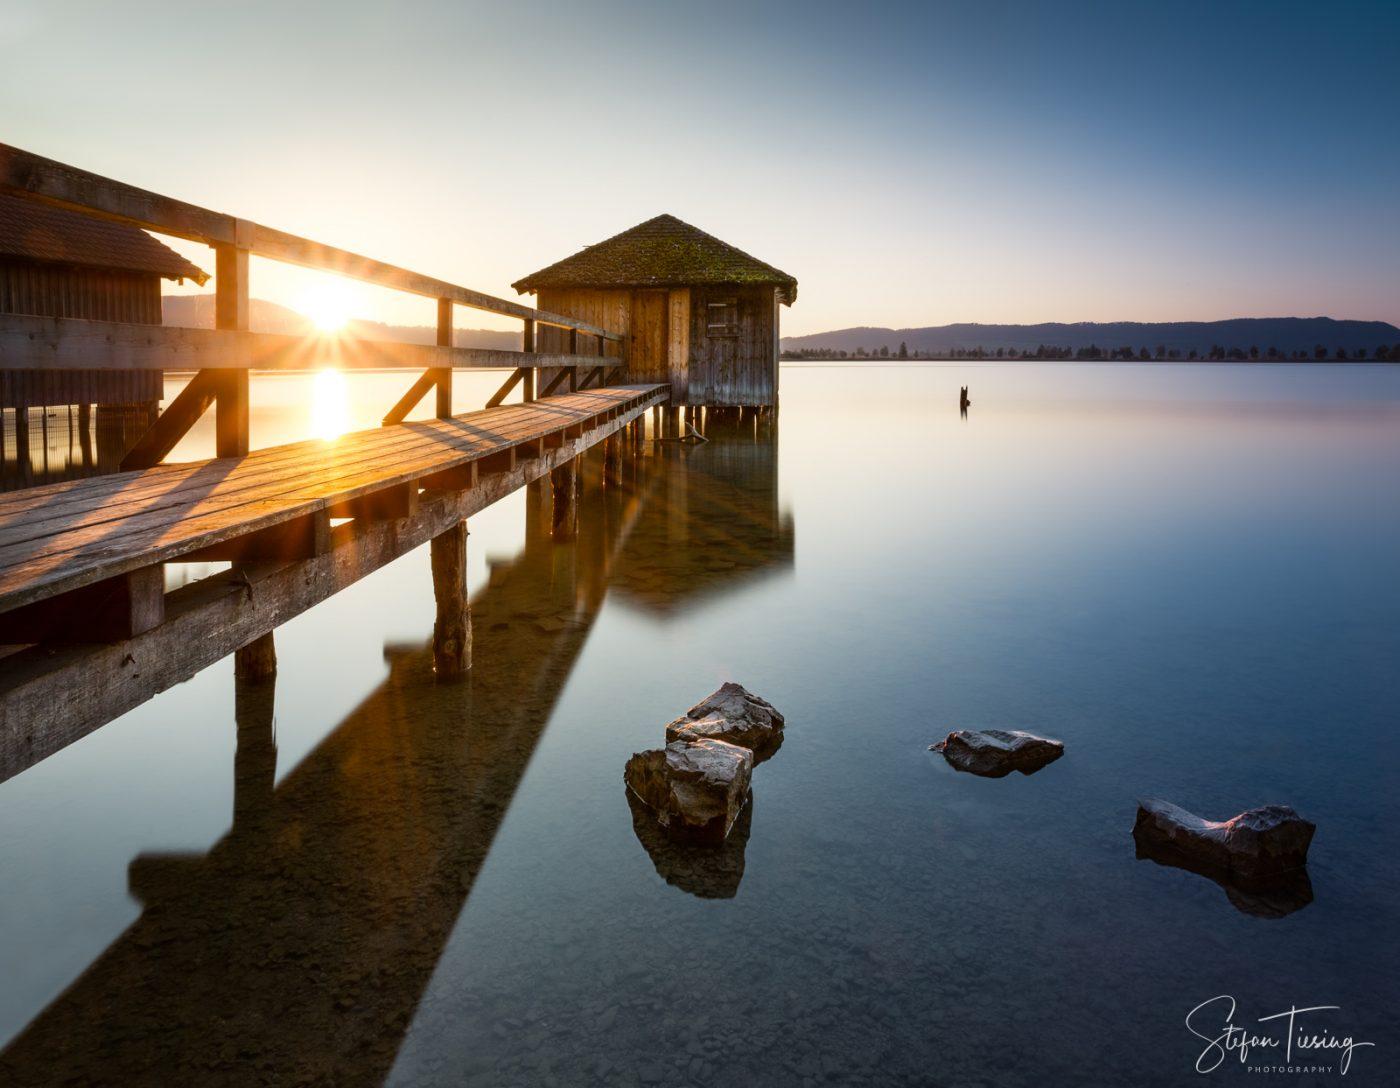 Bootshaus am Kochelsee im Sonnenuntergang